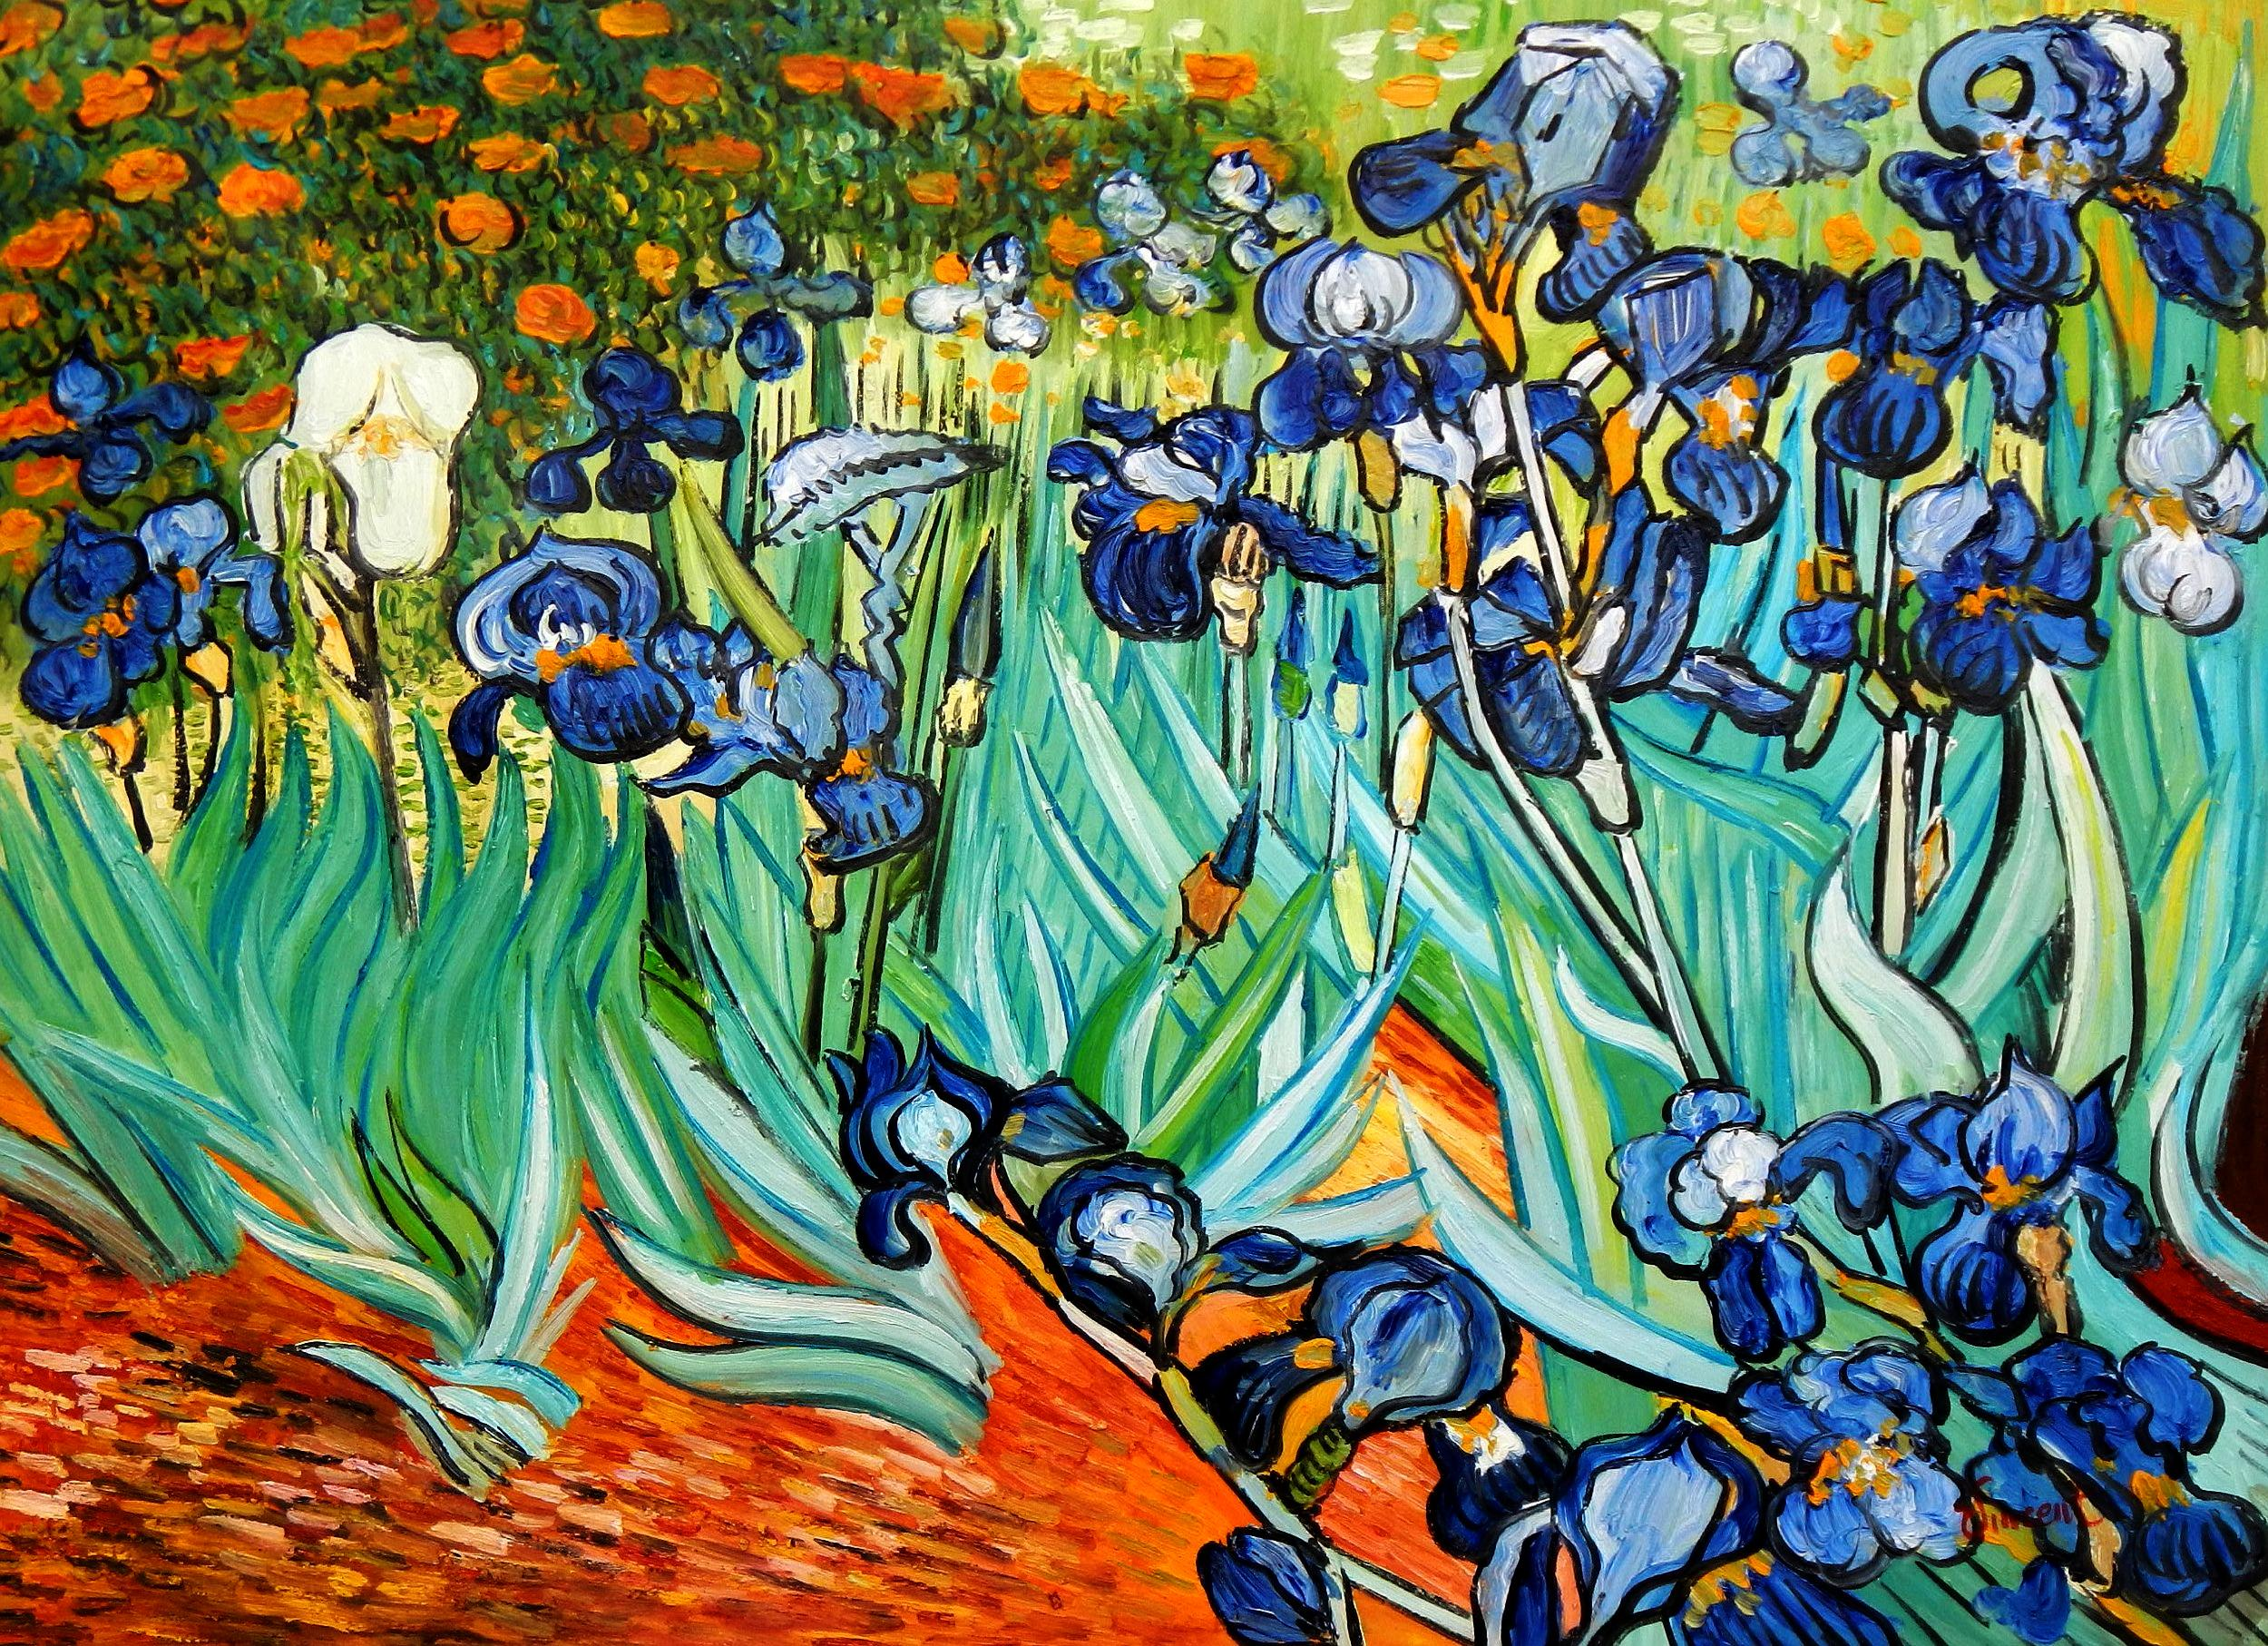 Vincent van Gogh - Blaue Iris i94699 80x110cm exzellentes Ölgemälde handgemalt